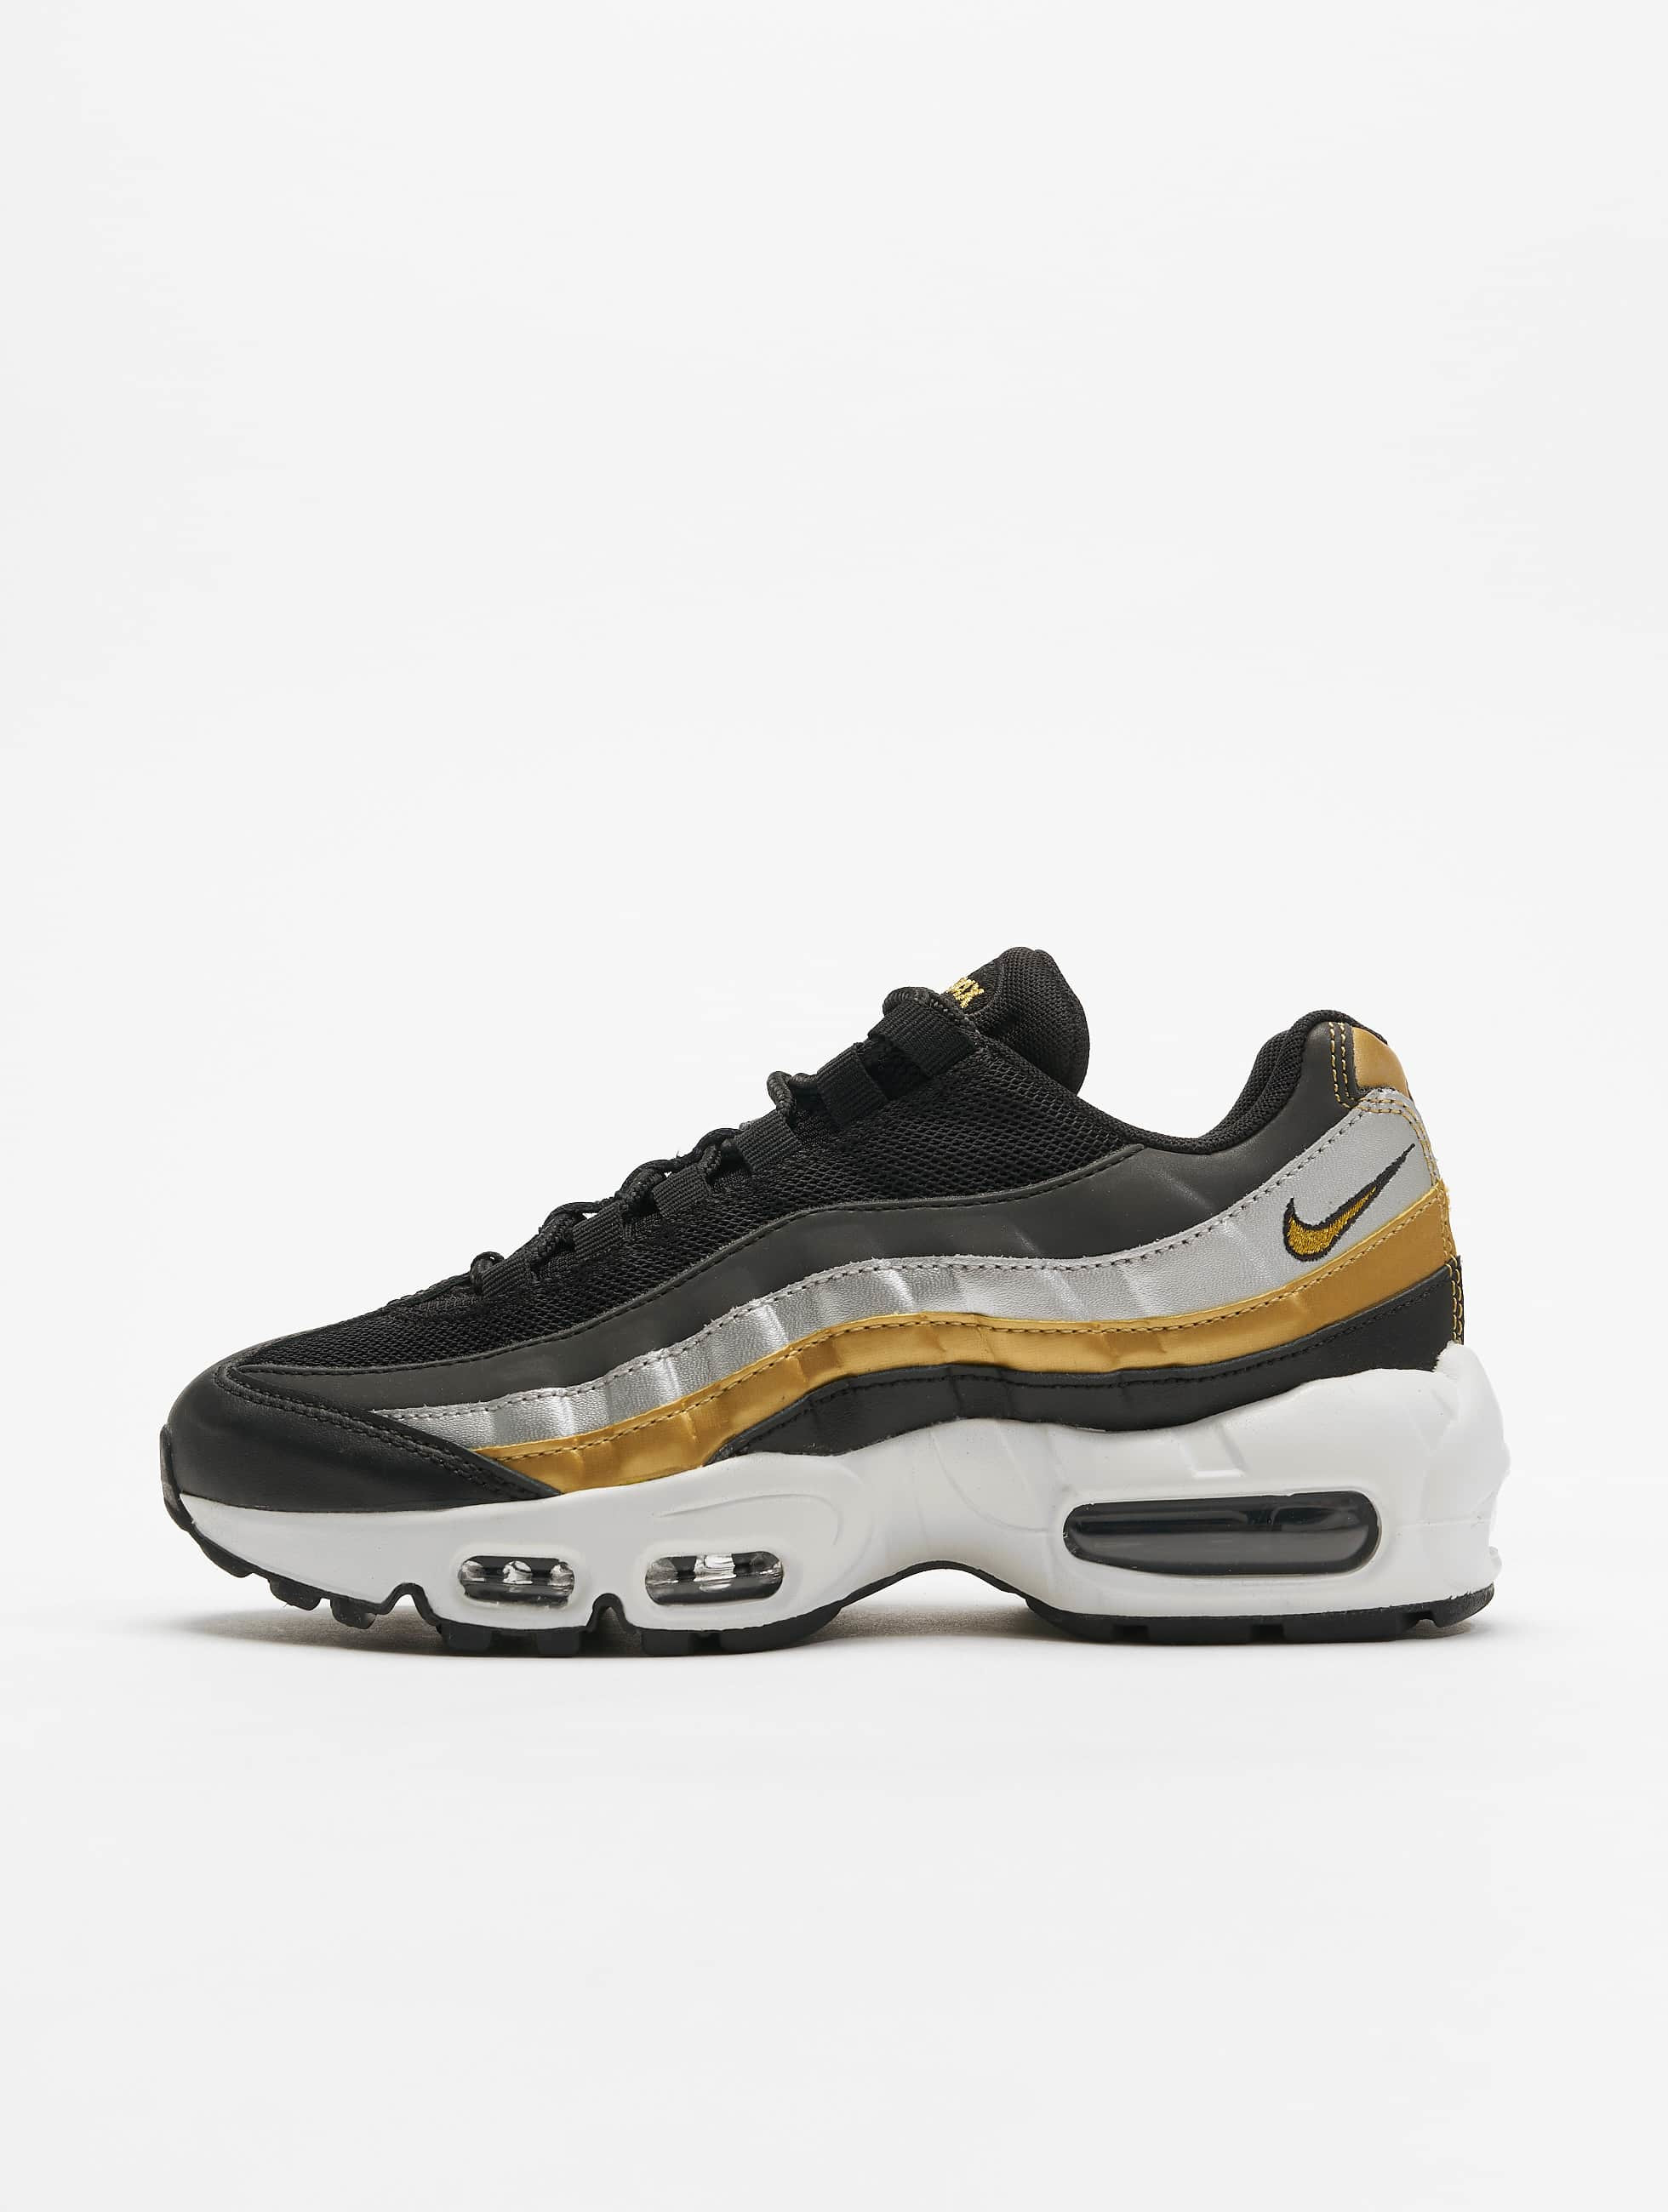 Nike Womens Air Max 95 Sneakers BlackMetallic Golden Metallic Silvern